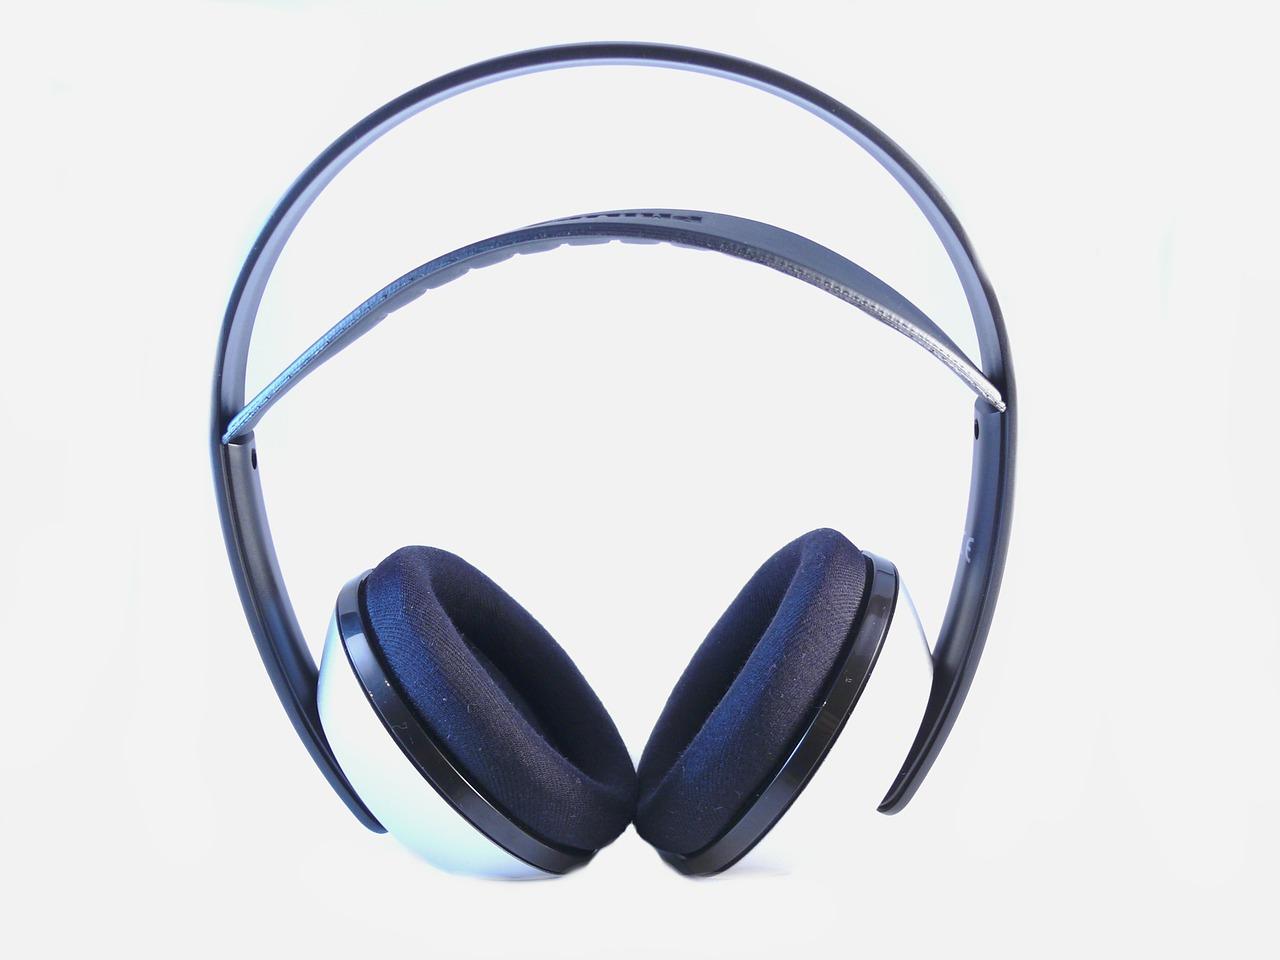 headphones-15600_1280